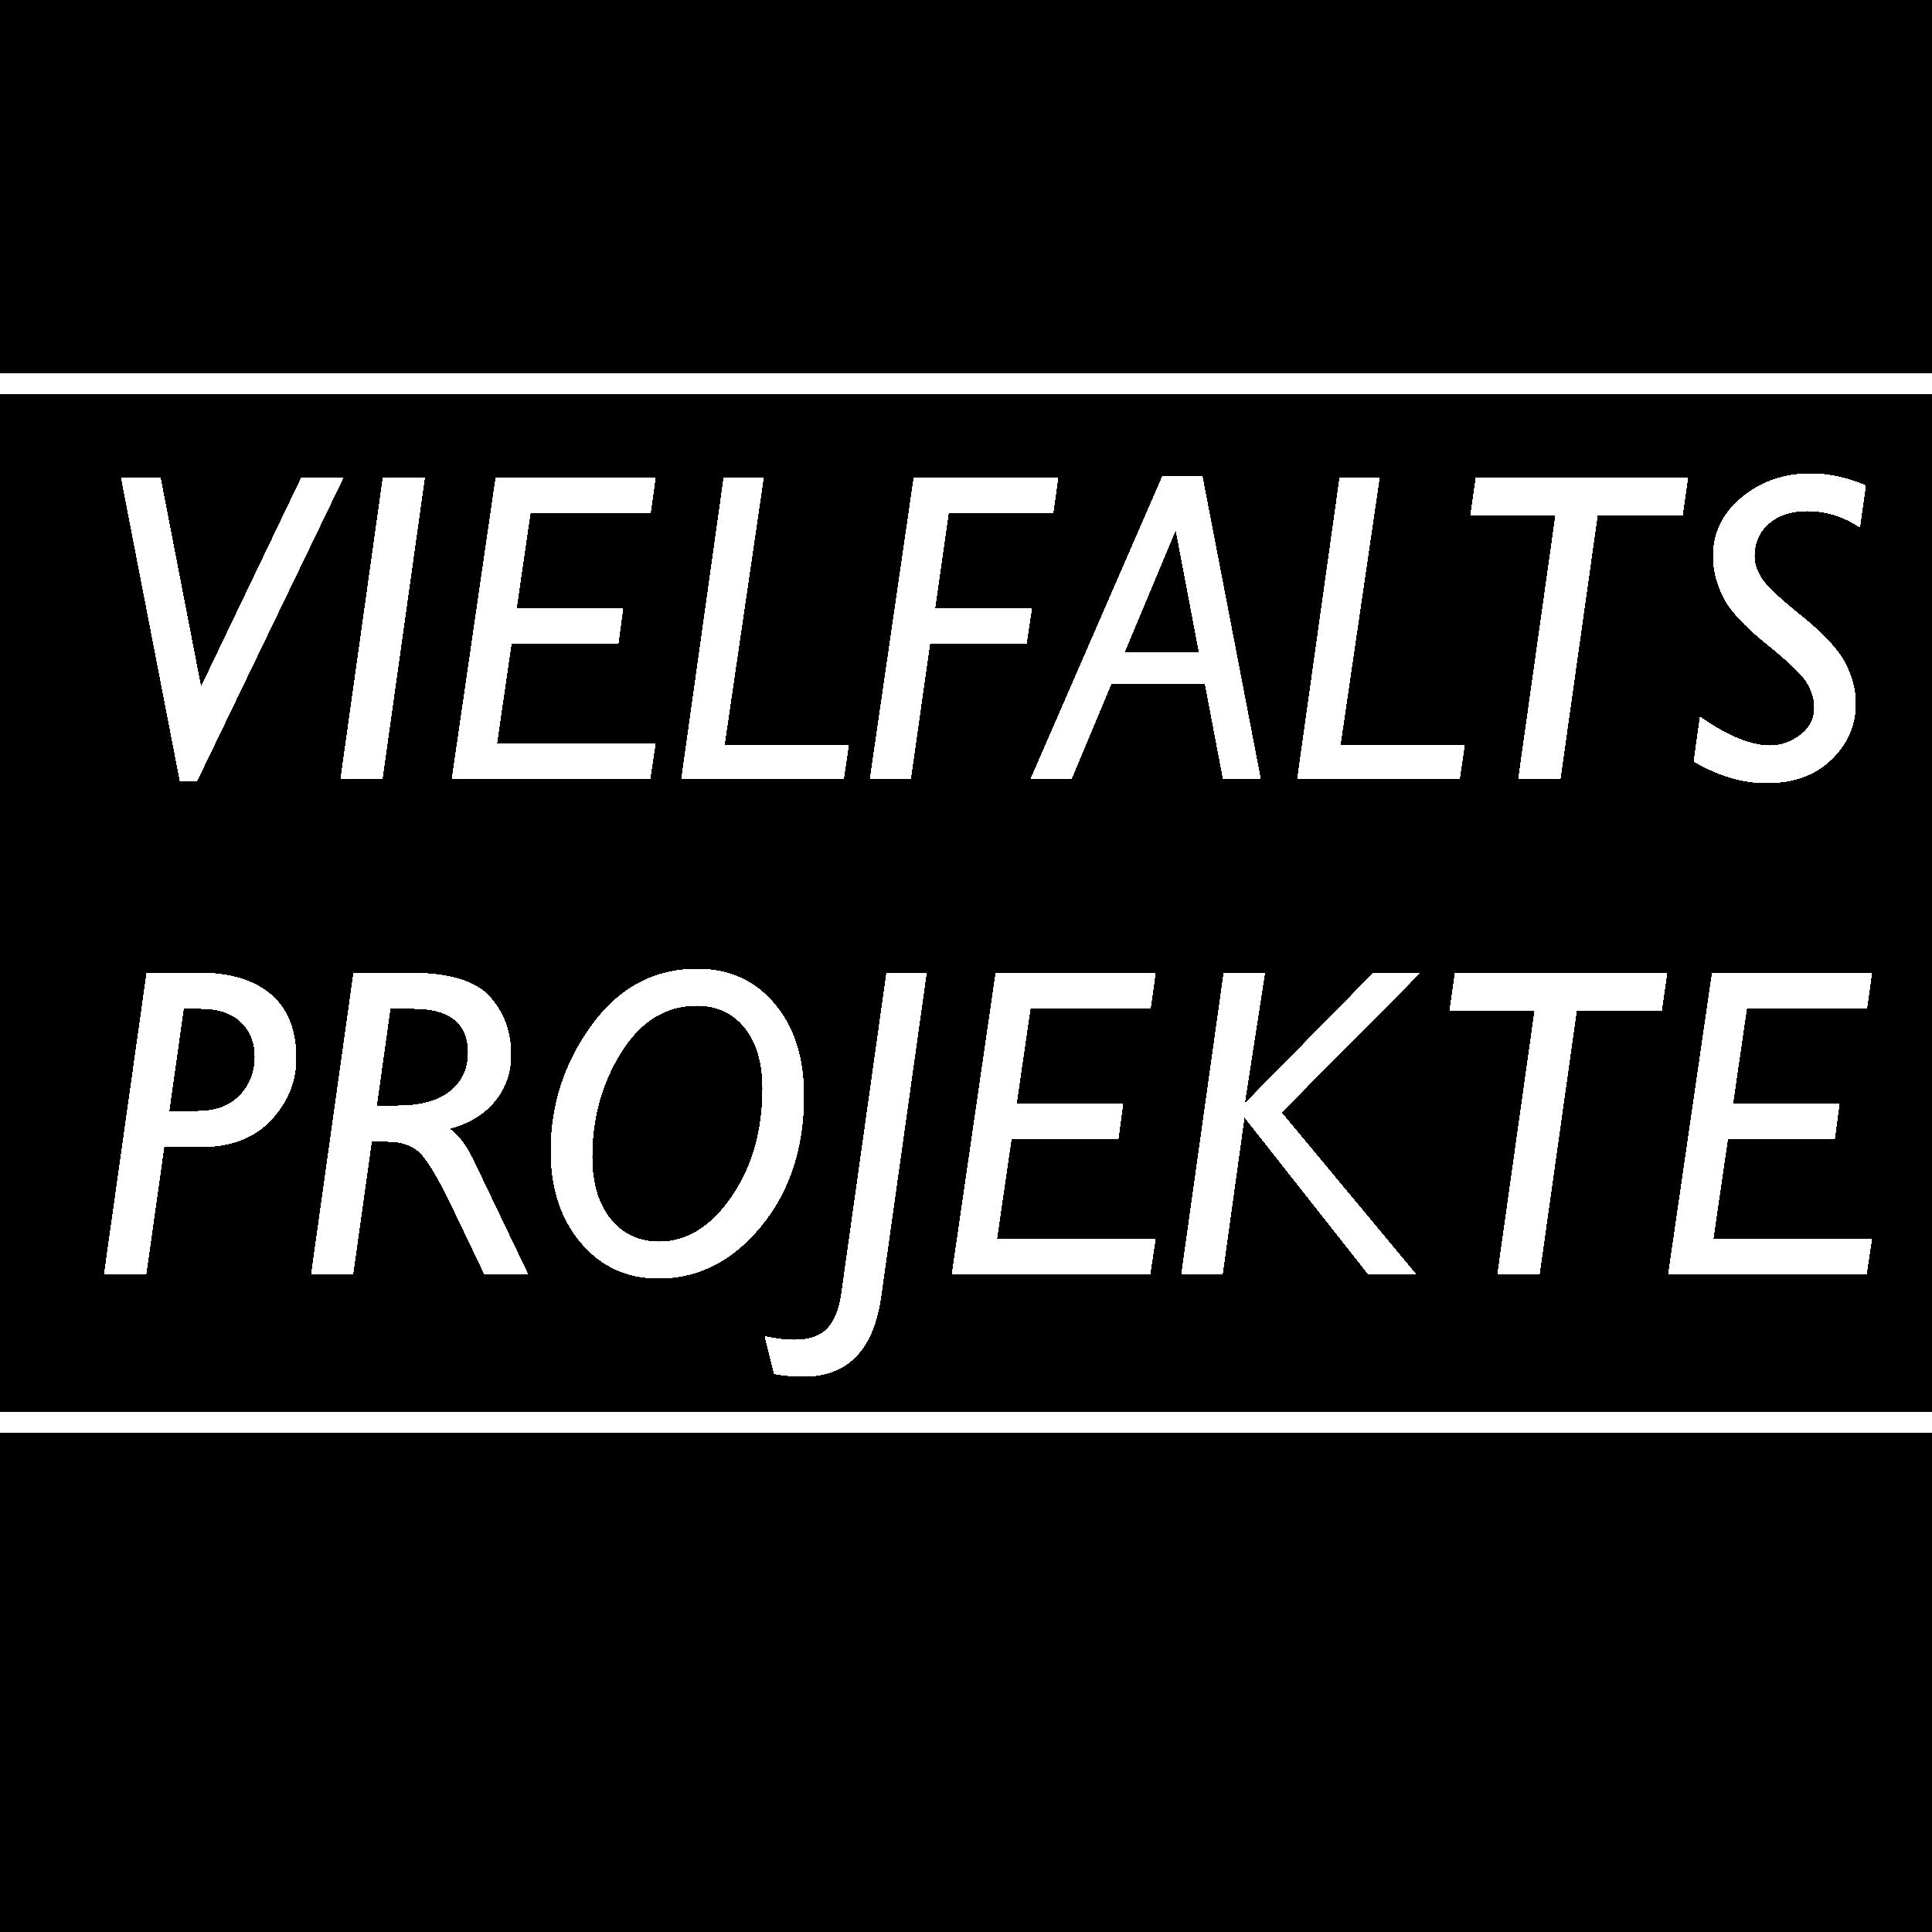 Vielfaltsprojekte